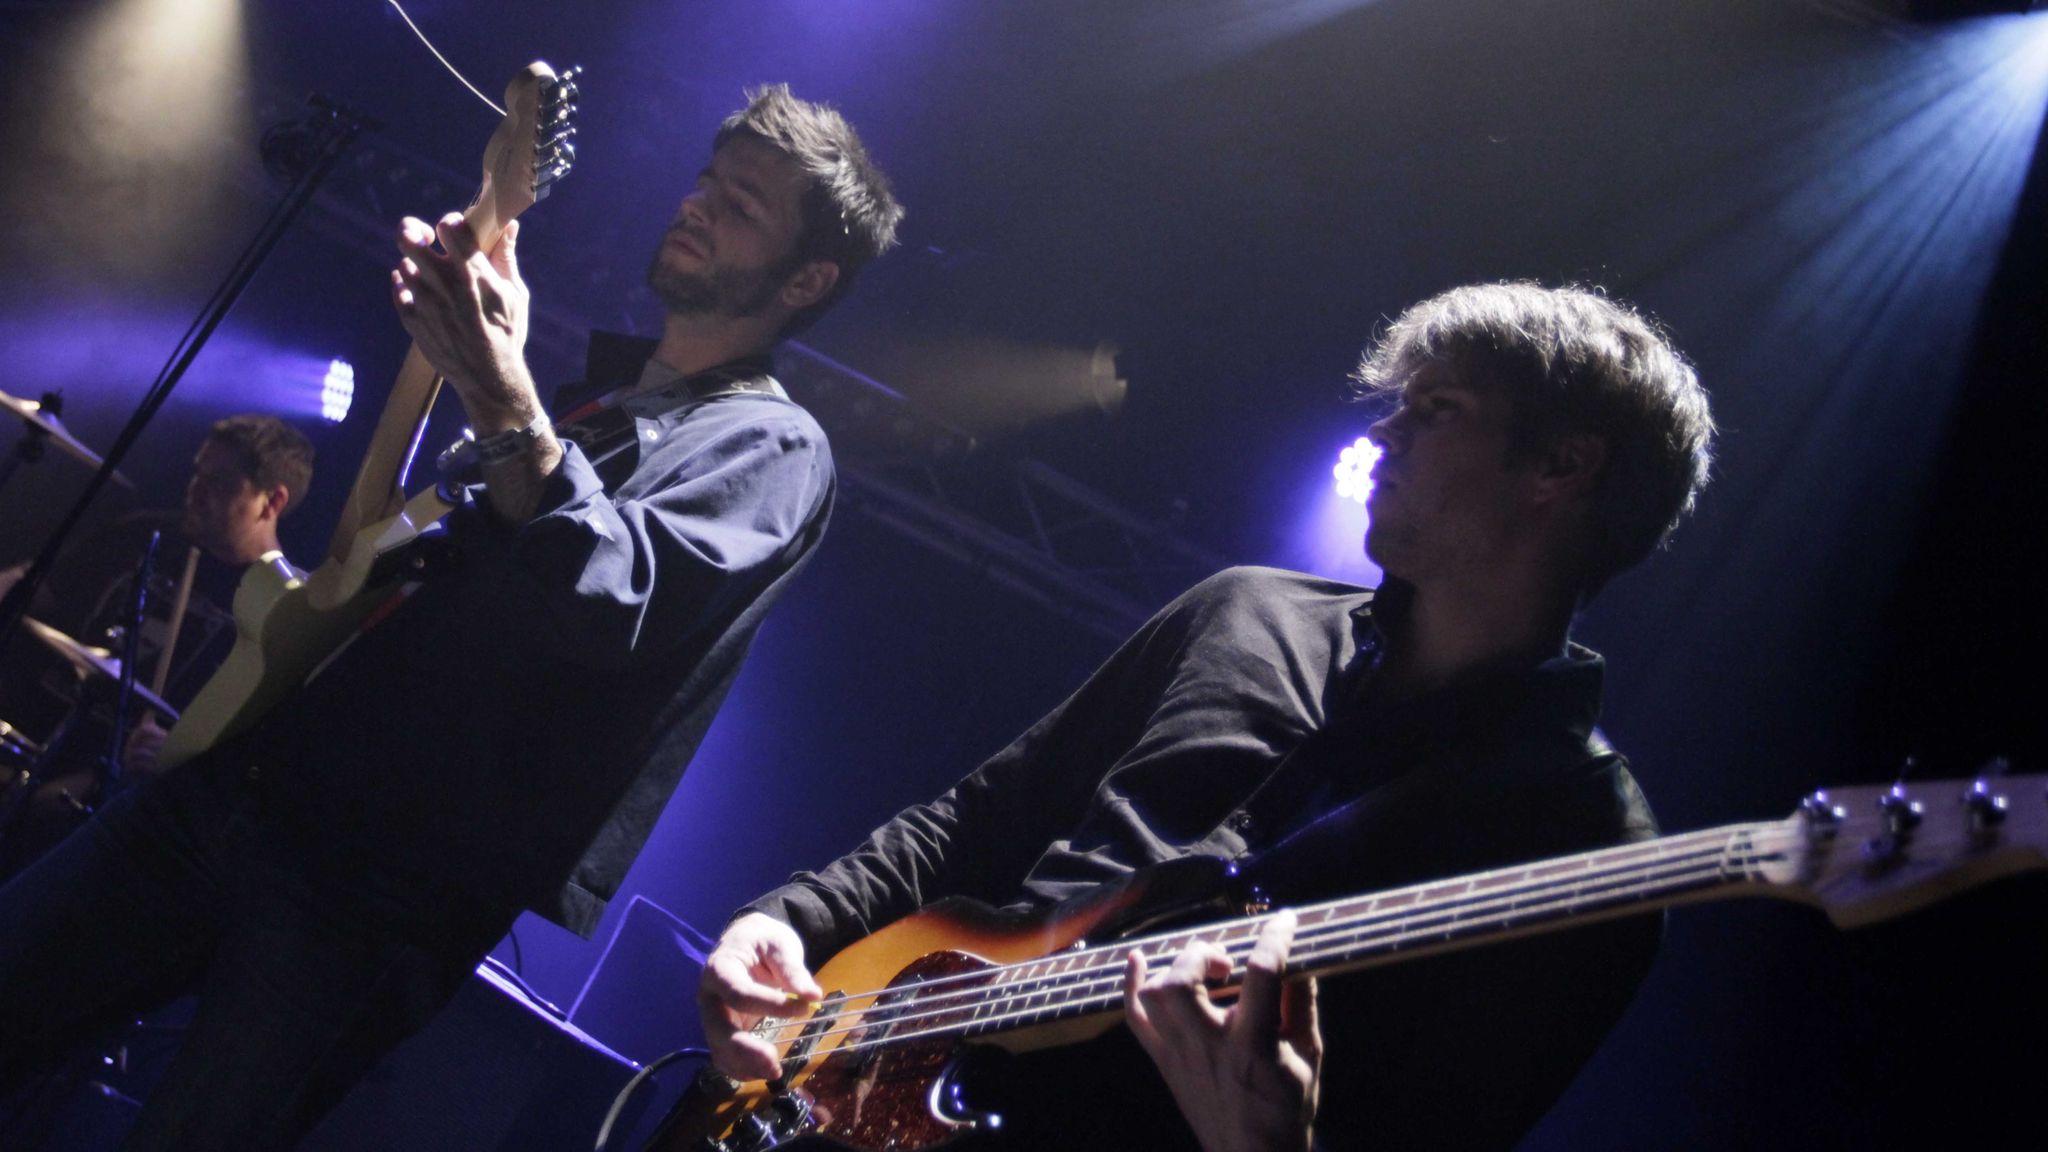 StellarDog-Tour2Chauffe-Nautilys-2012-66